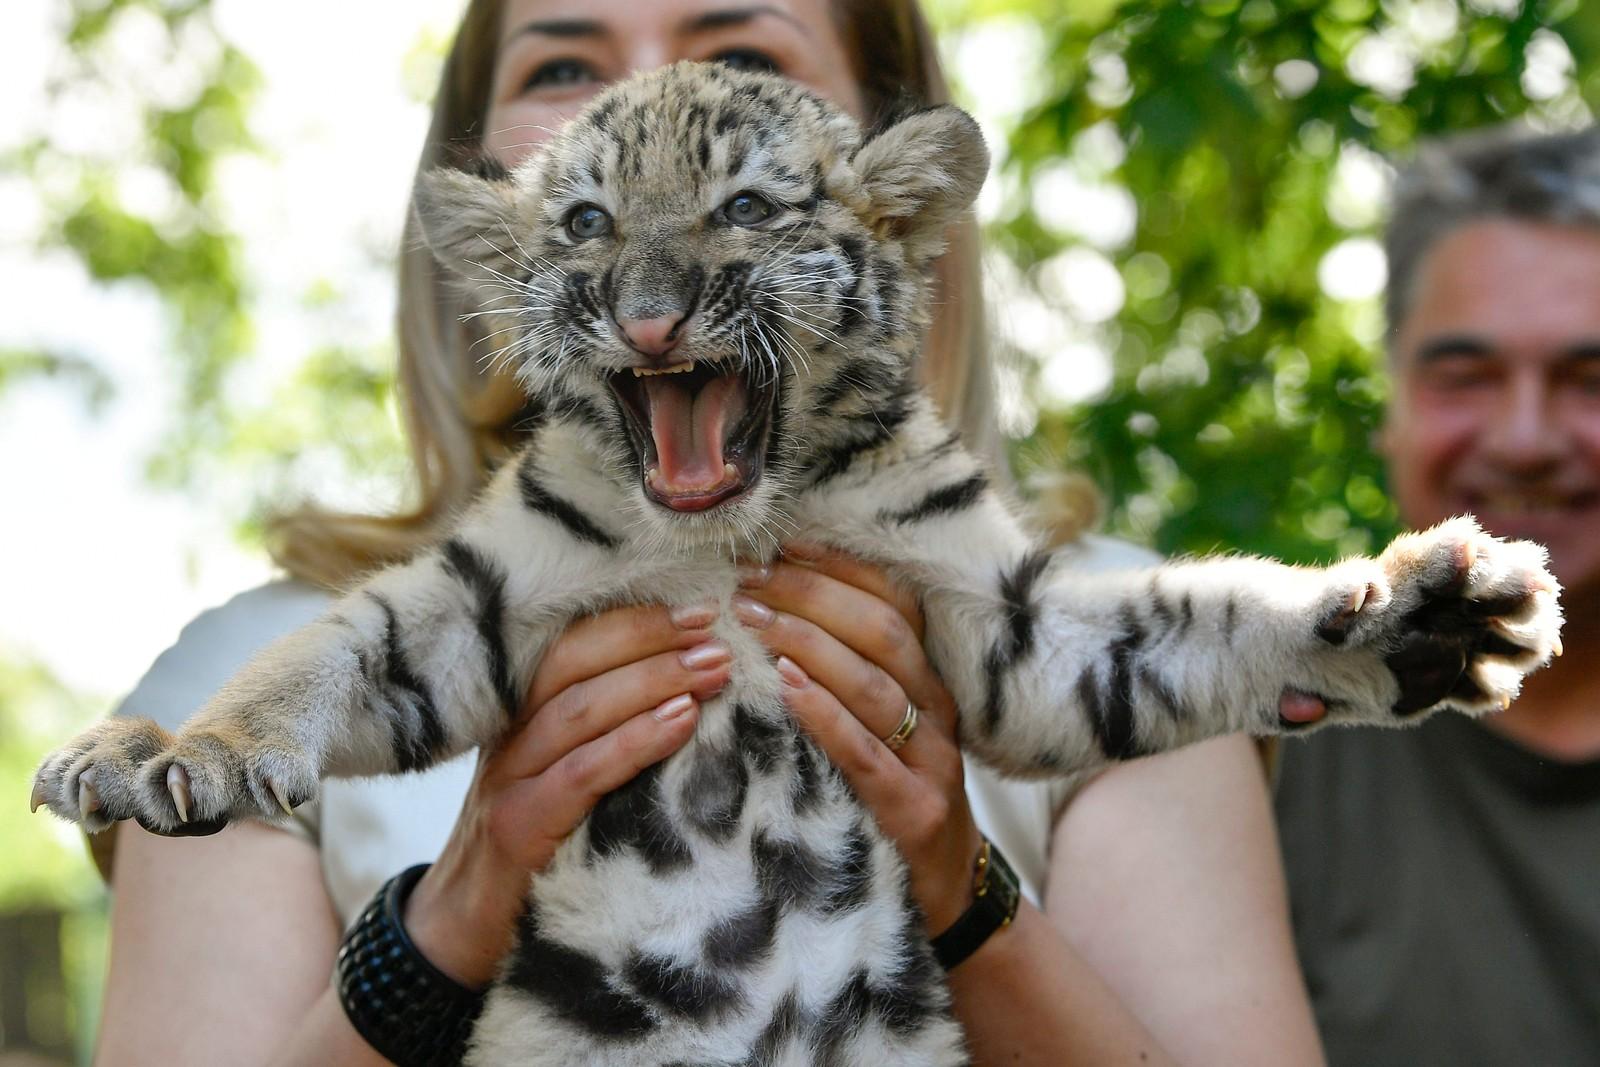 Syv og en halv uke gammel fikk denne sibirske tigeren møte pressen i Debrecen dyrehage i Ungarn.